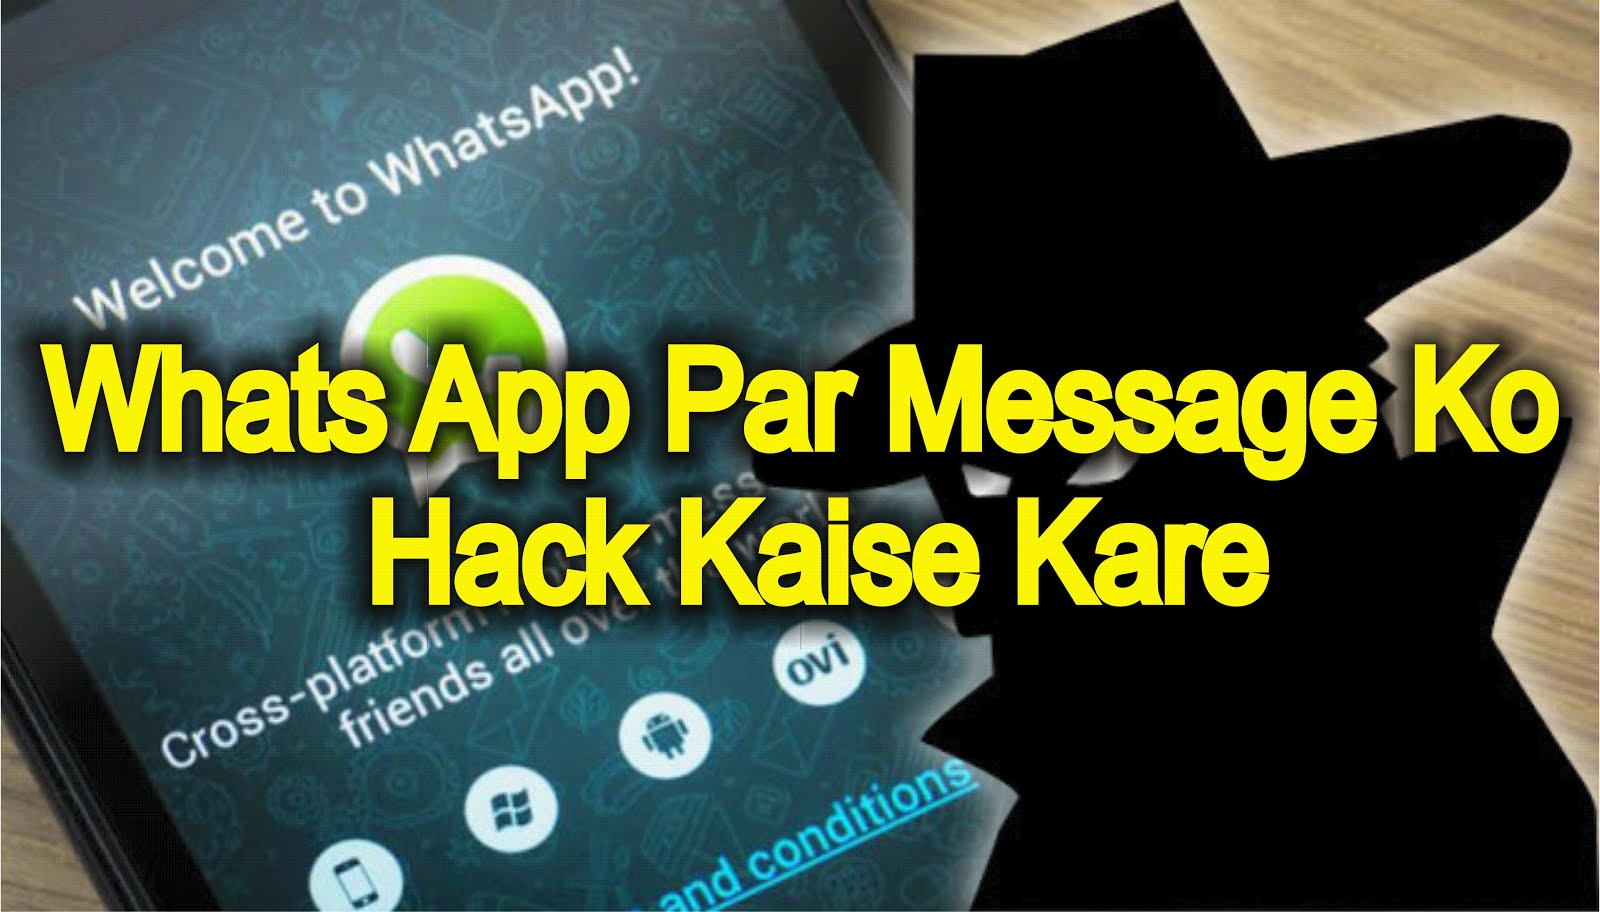 Whatsapp Par Message Ko Hack Kaise Kare in Hindi - Use Whats